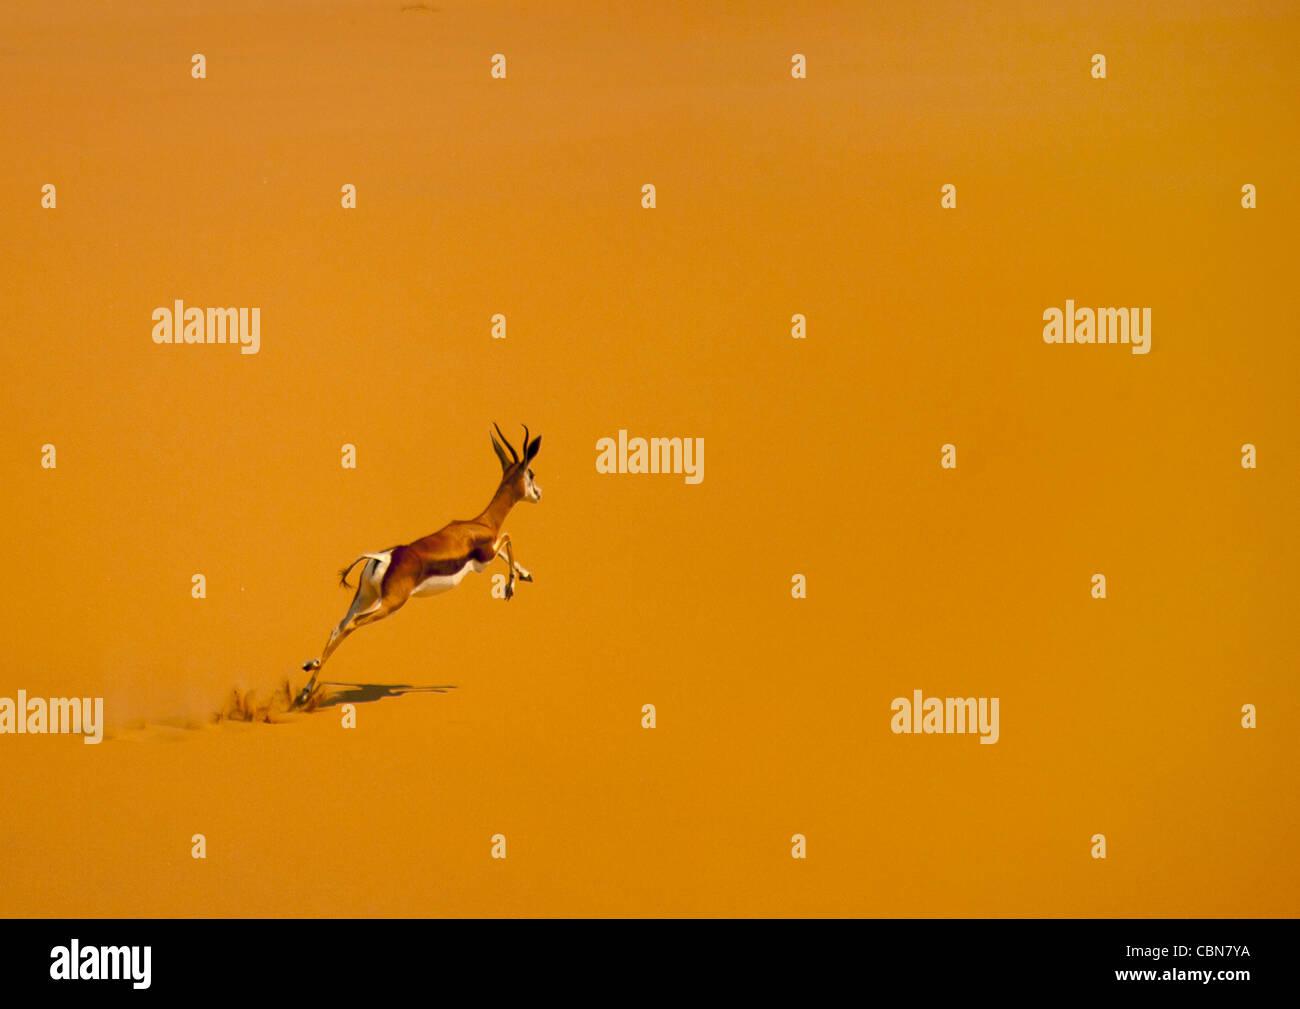 Springbok Jumping, Namib Desert, Angola - Stock Image